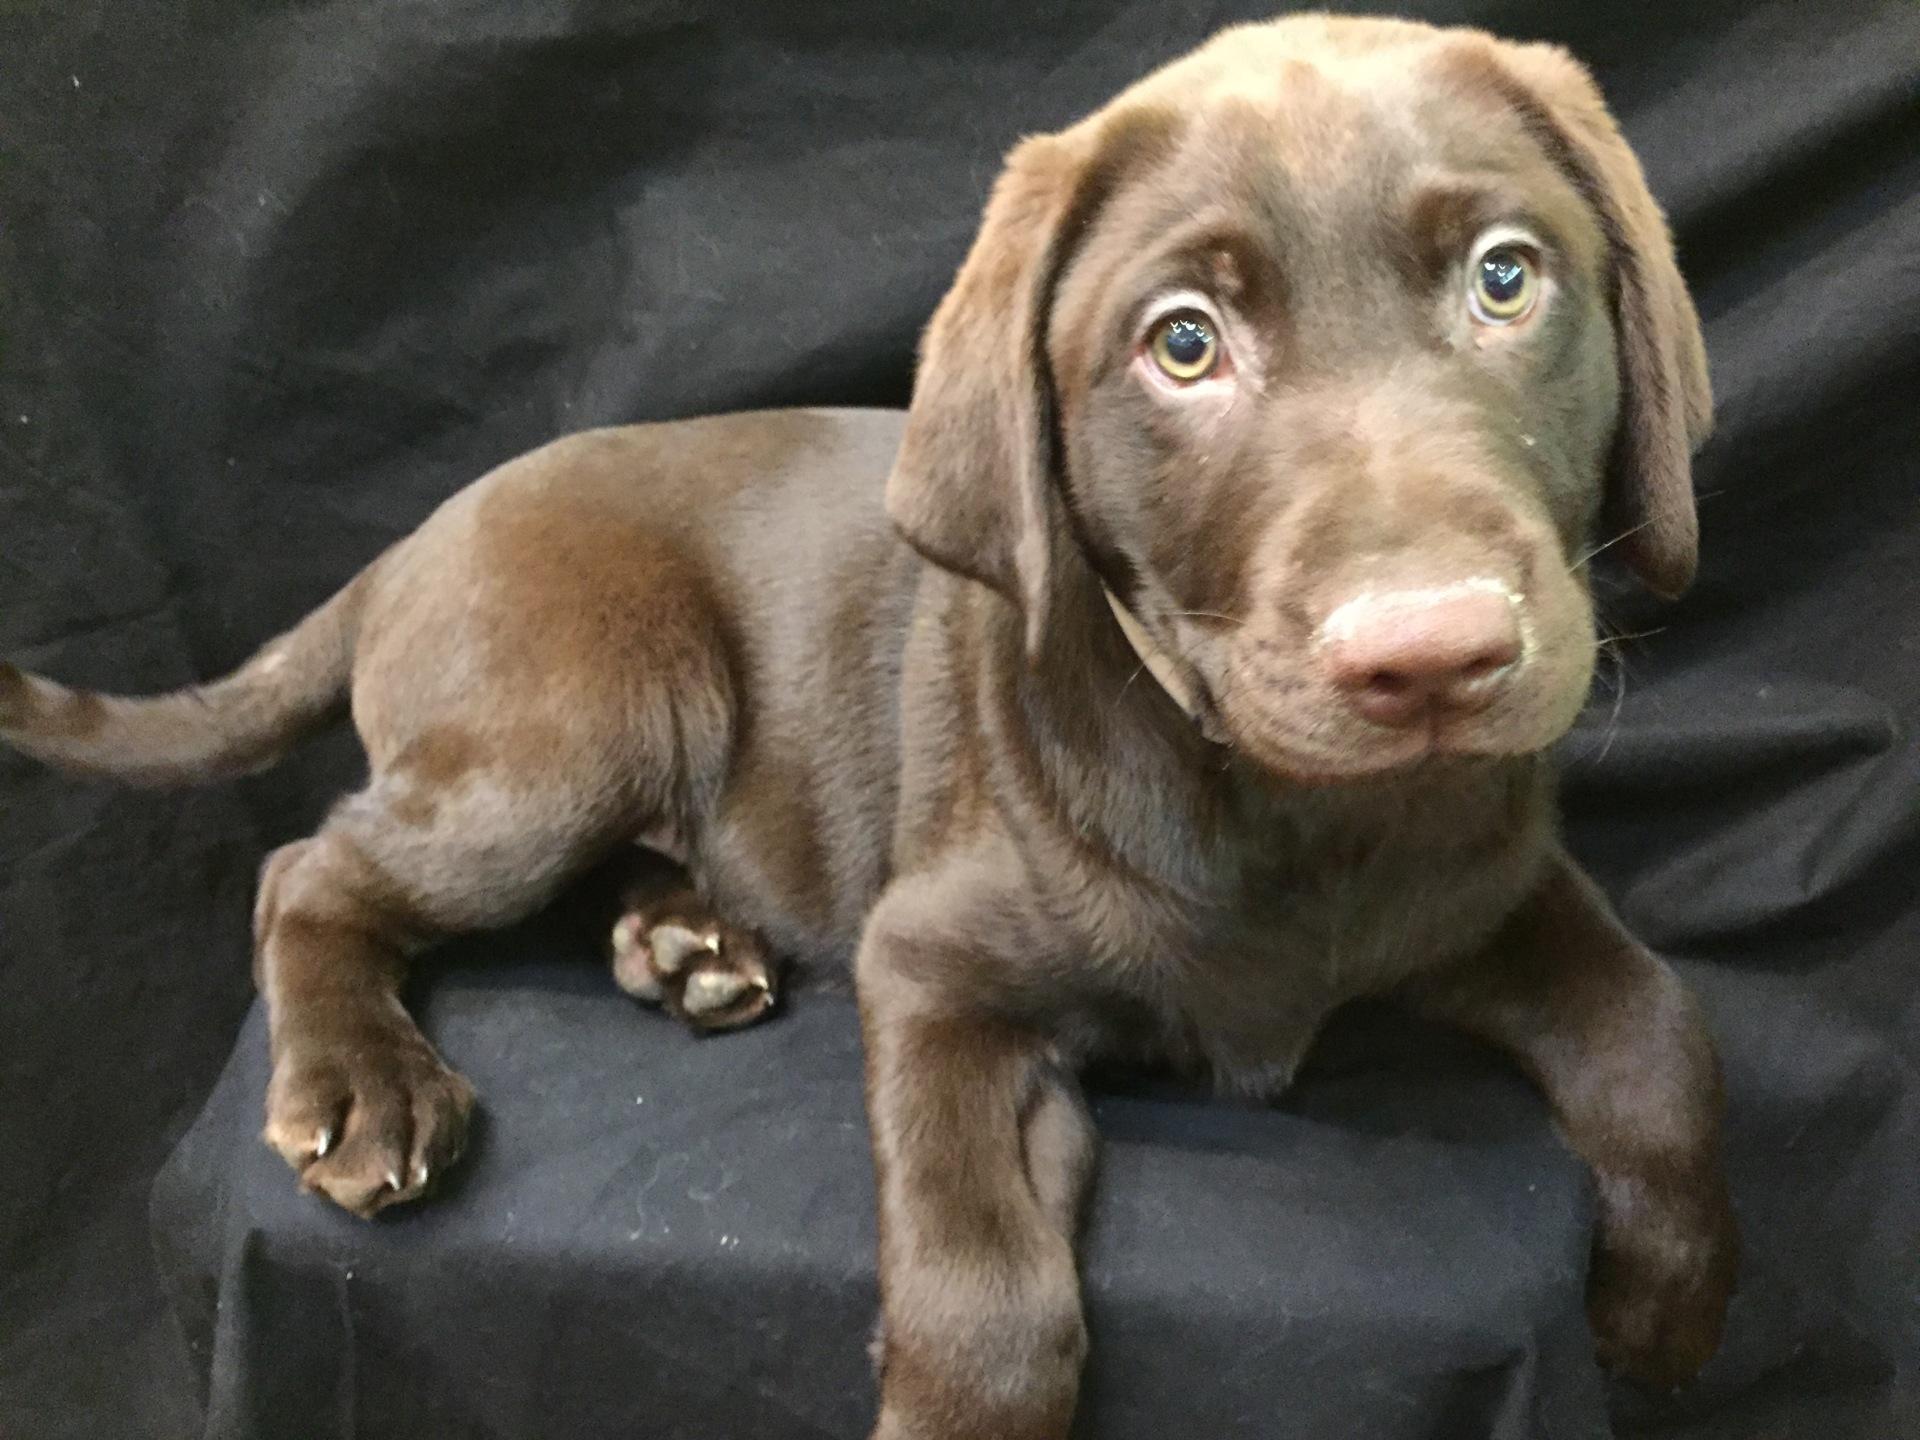 #2019 - Male Labrador